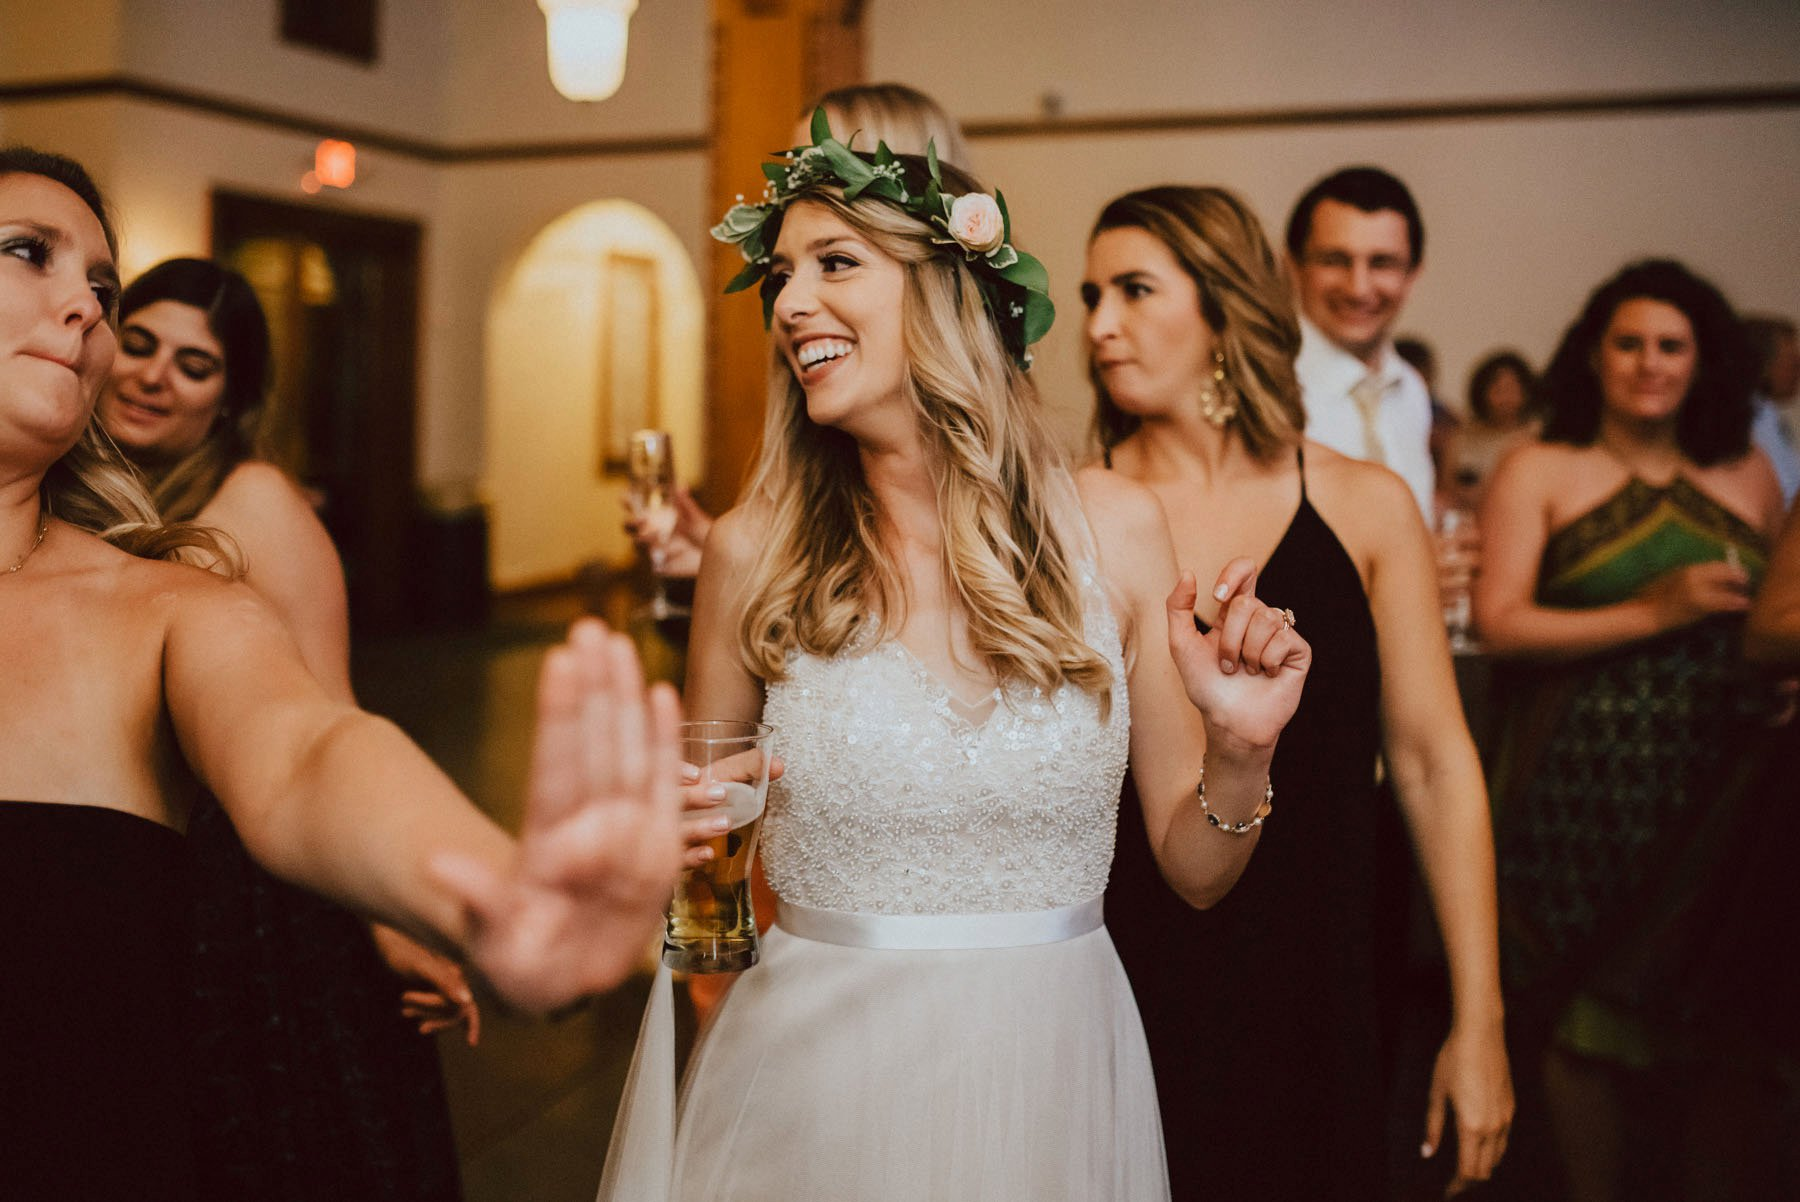 Knowlton-mansion-wedding-141.jpg